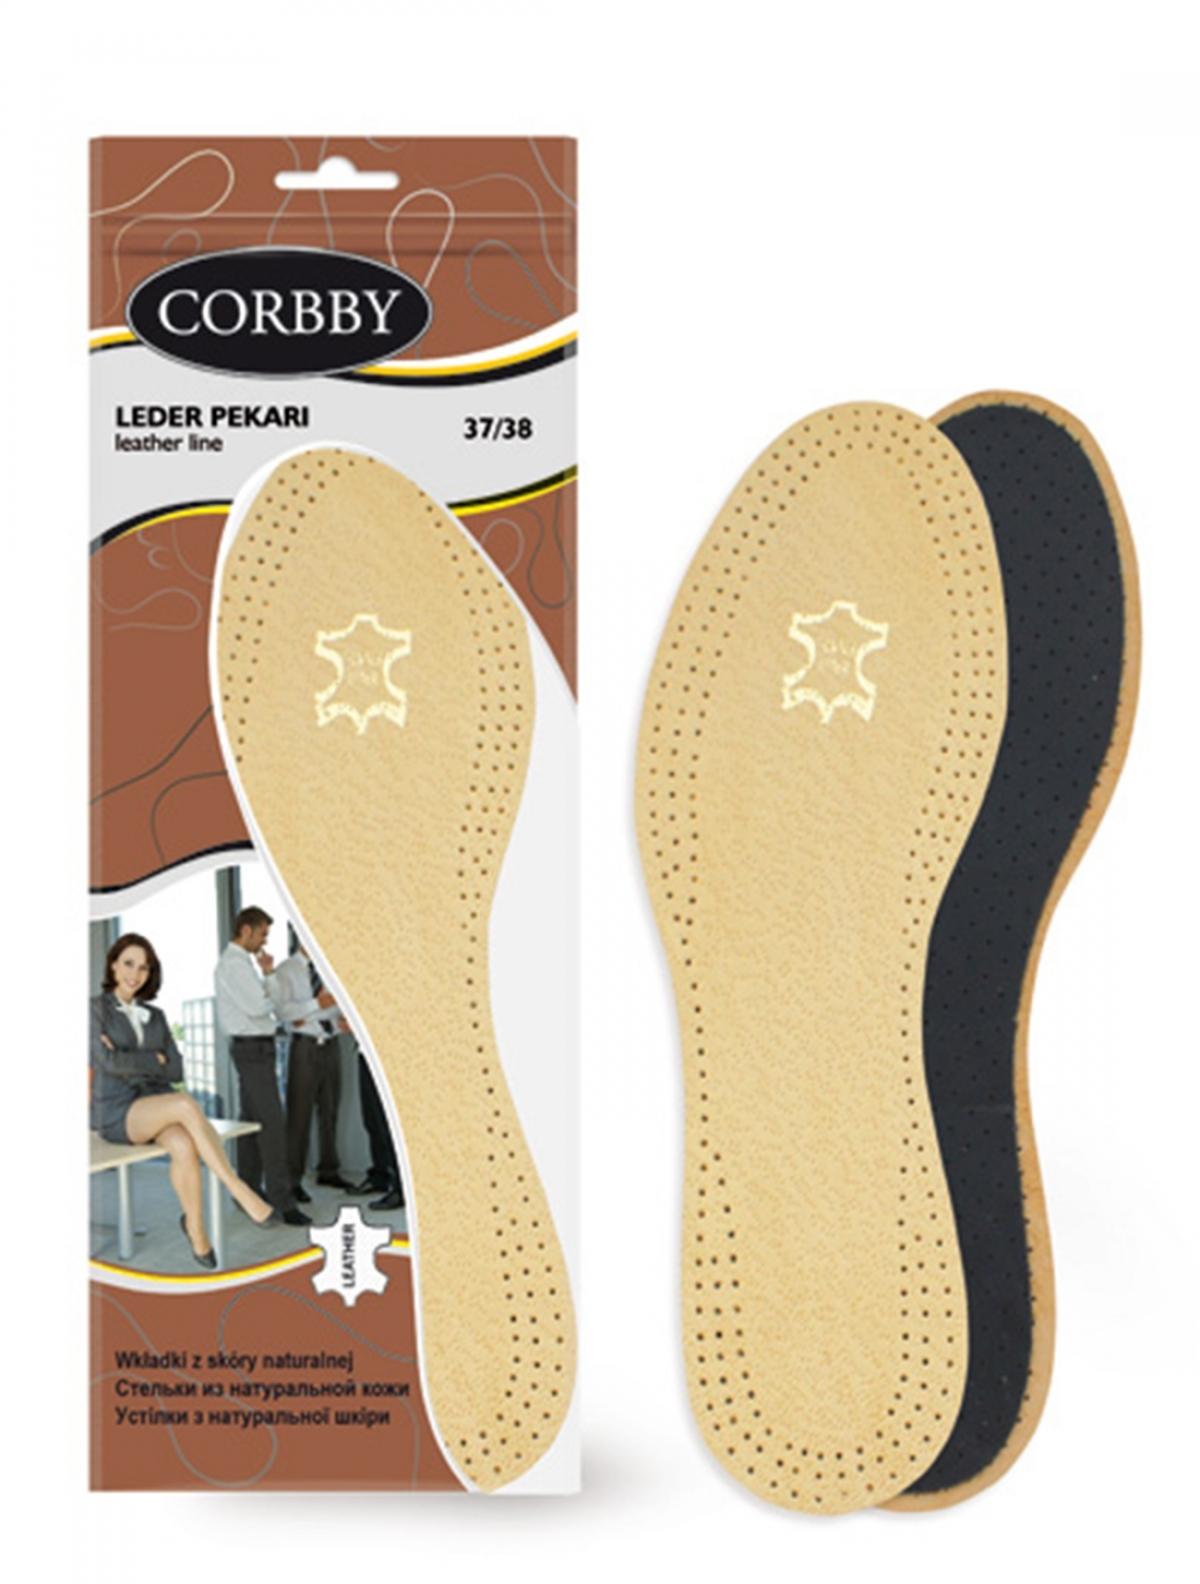 Corbby 1765 стельки 43/44